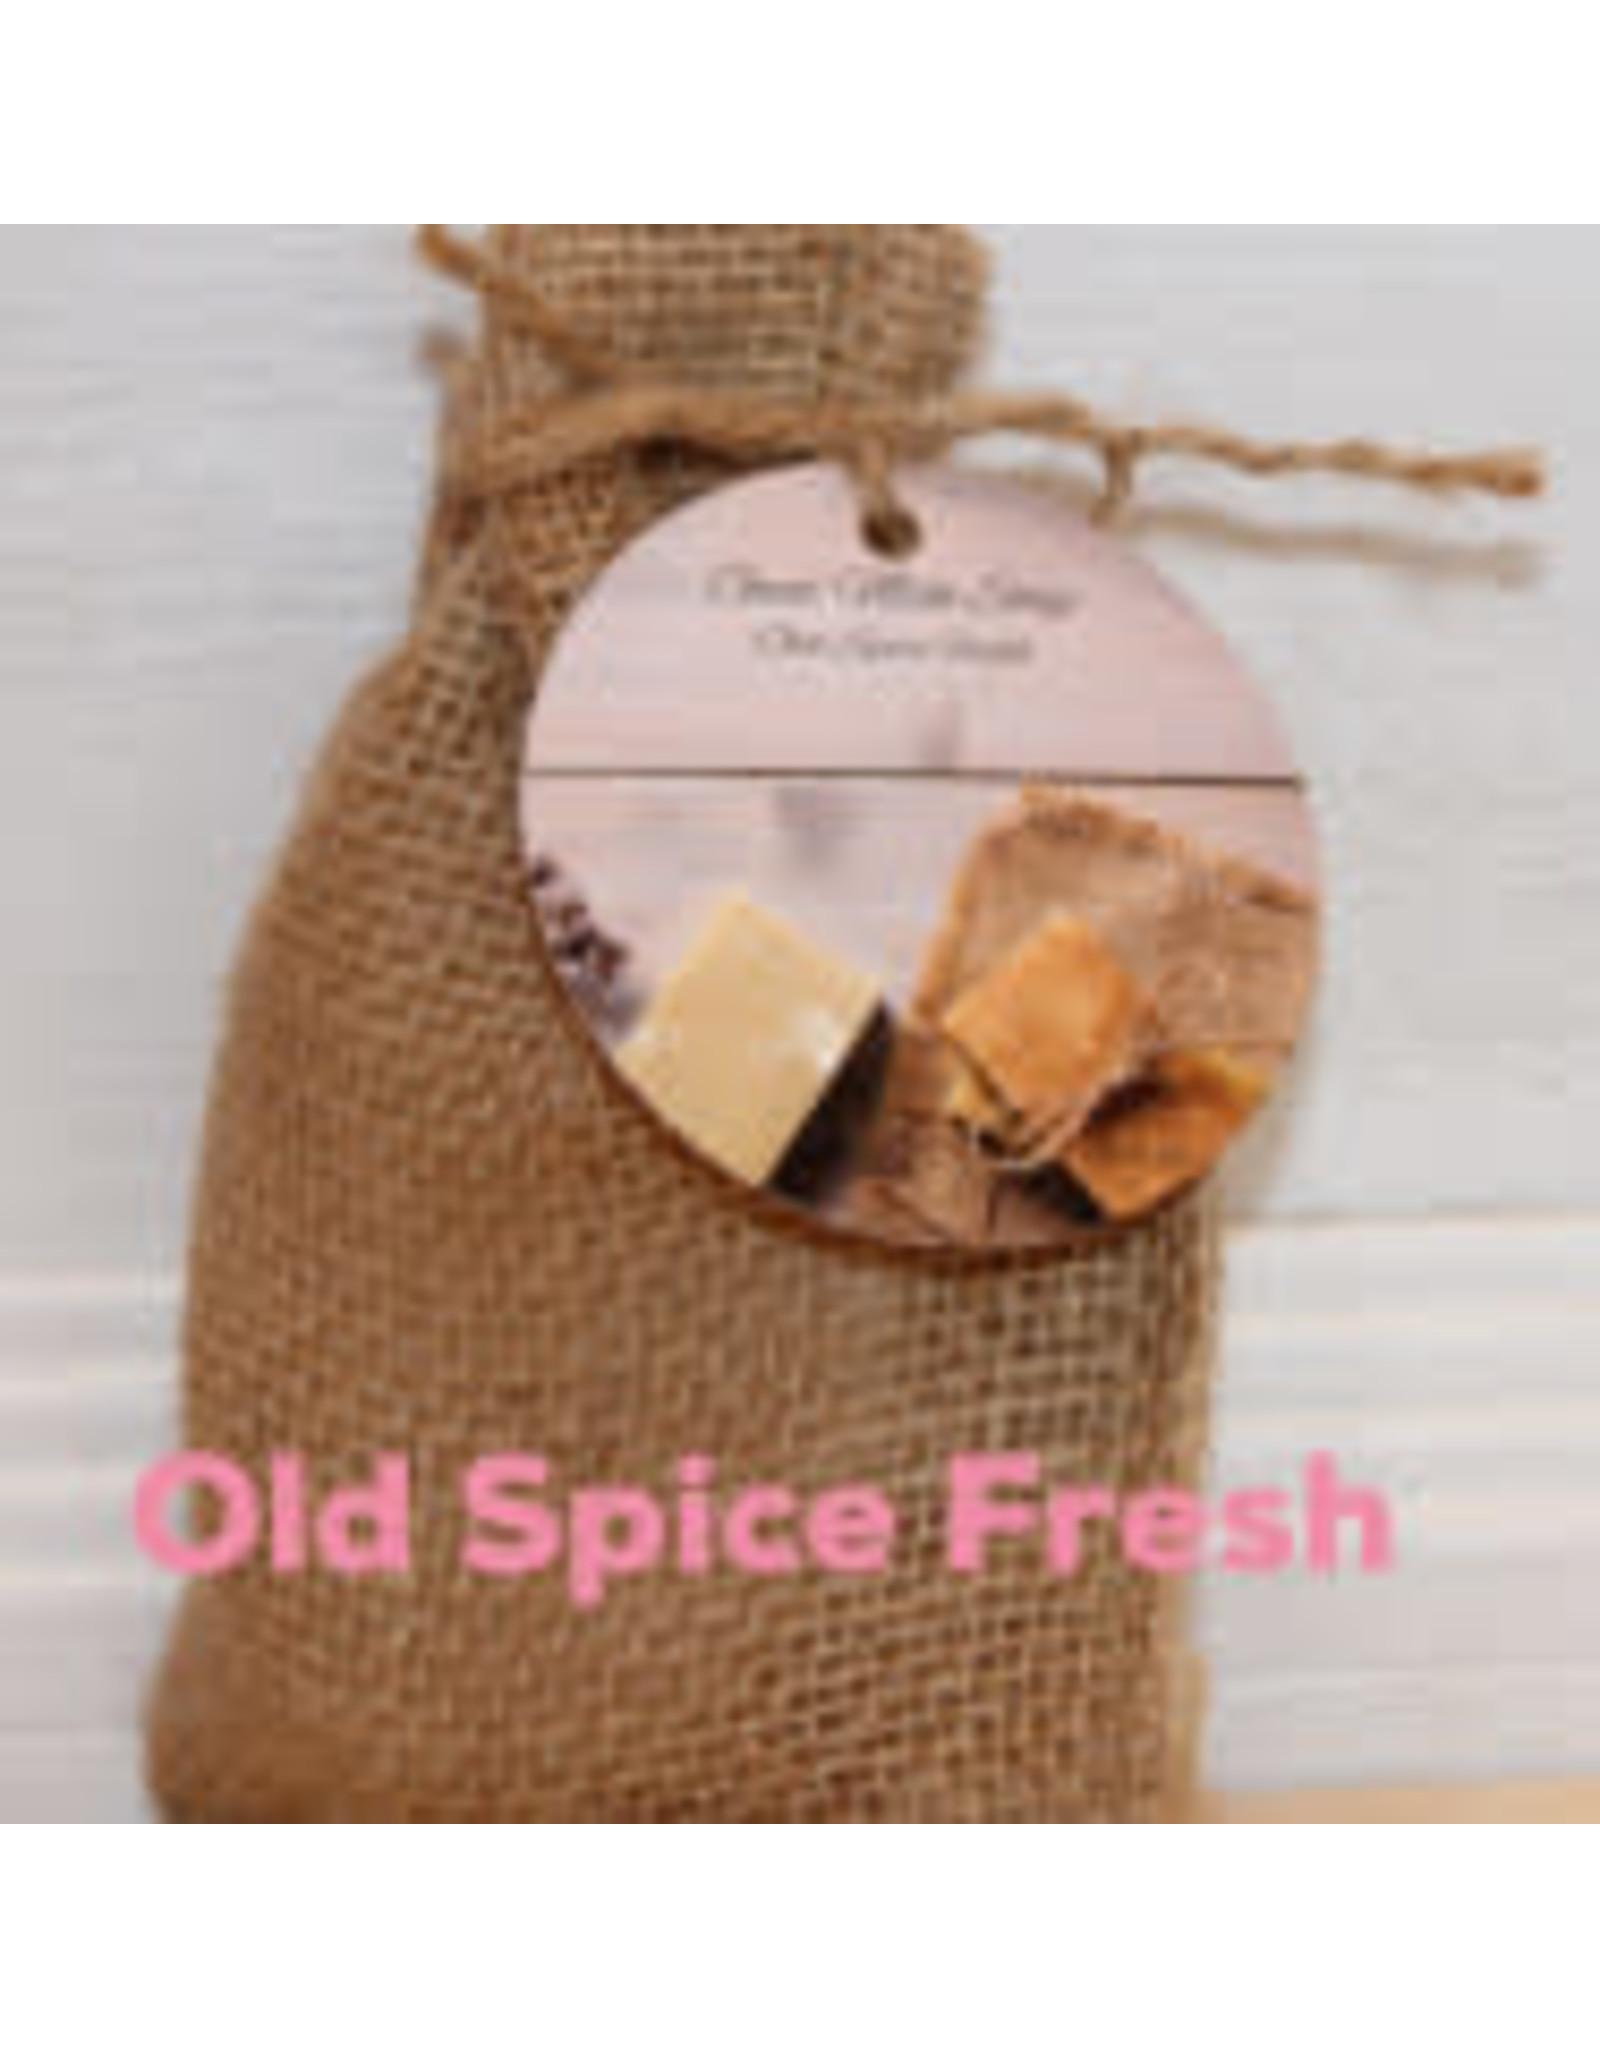 Fancy Goat Boutique Soap Old Spice Fresh